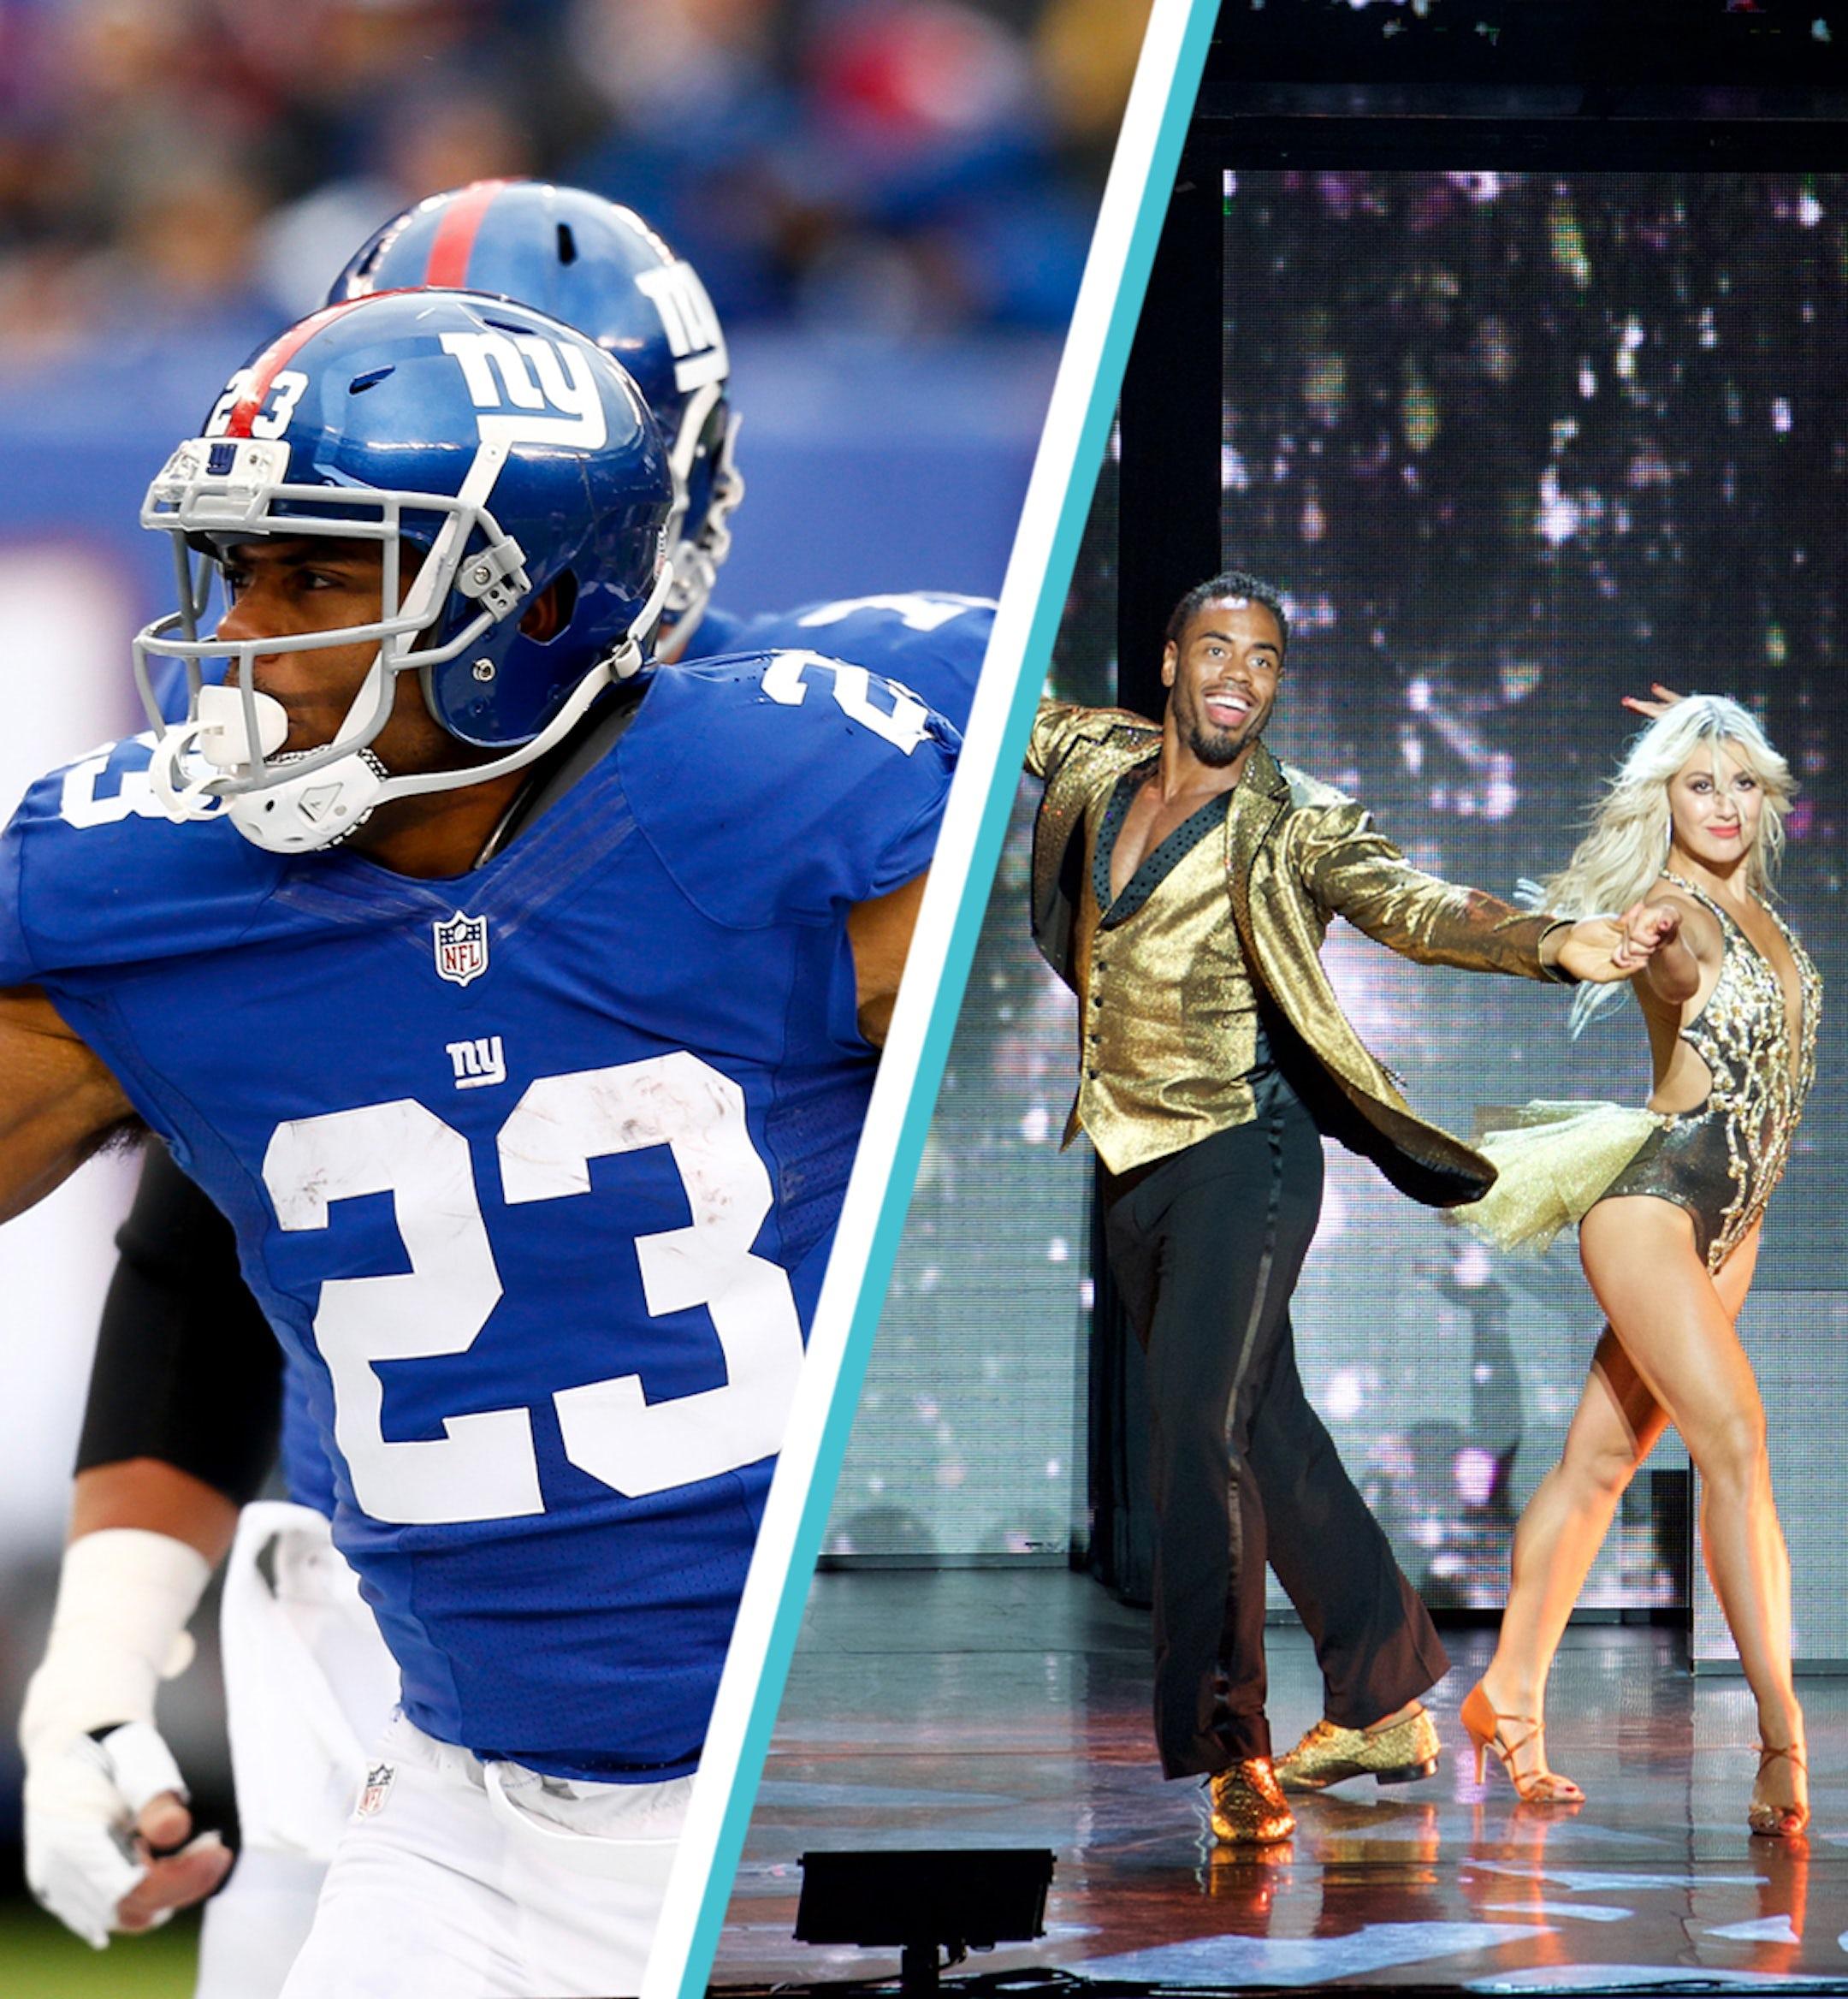 Rashad Jennings New York Giants Dancing With The Stars mobile